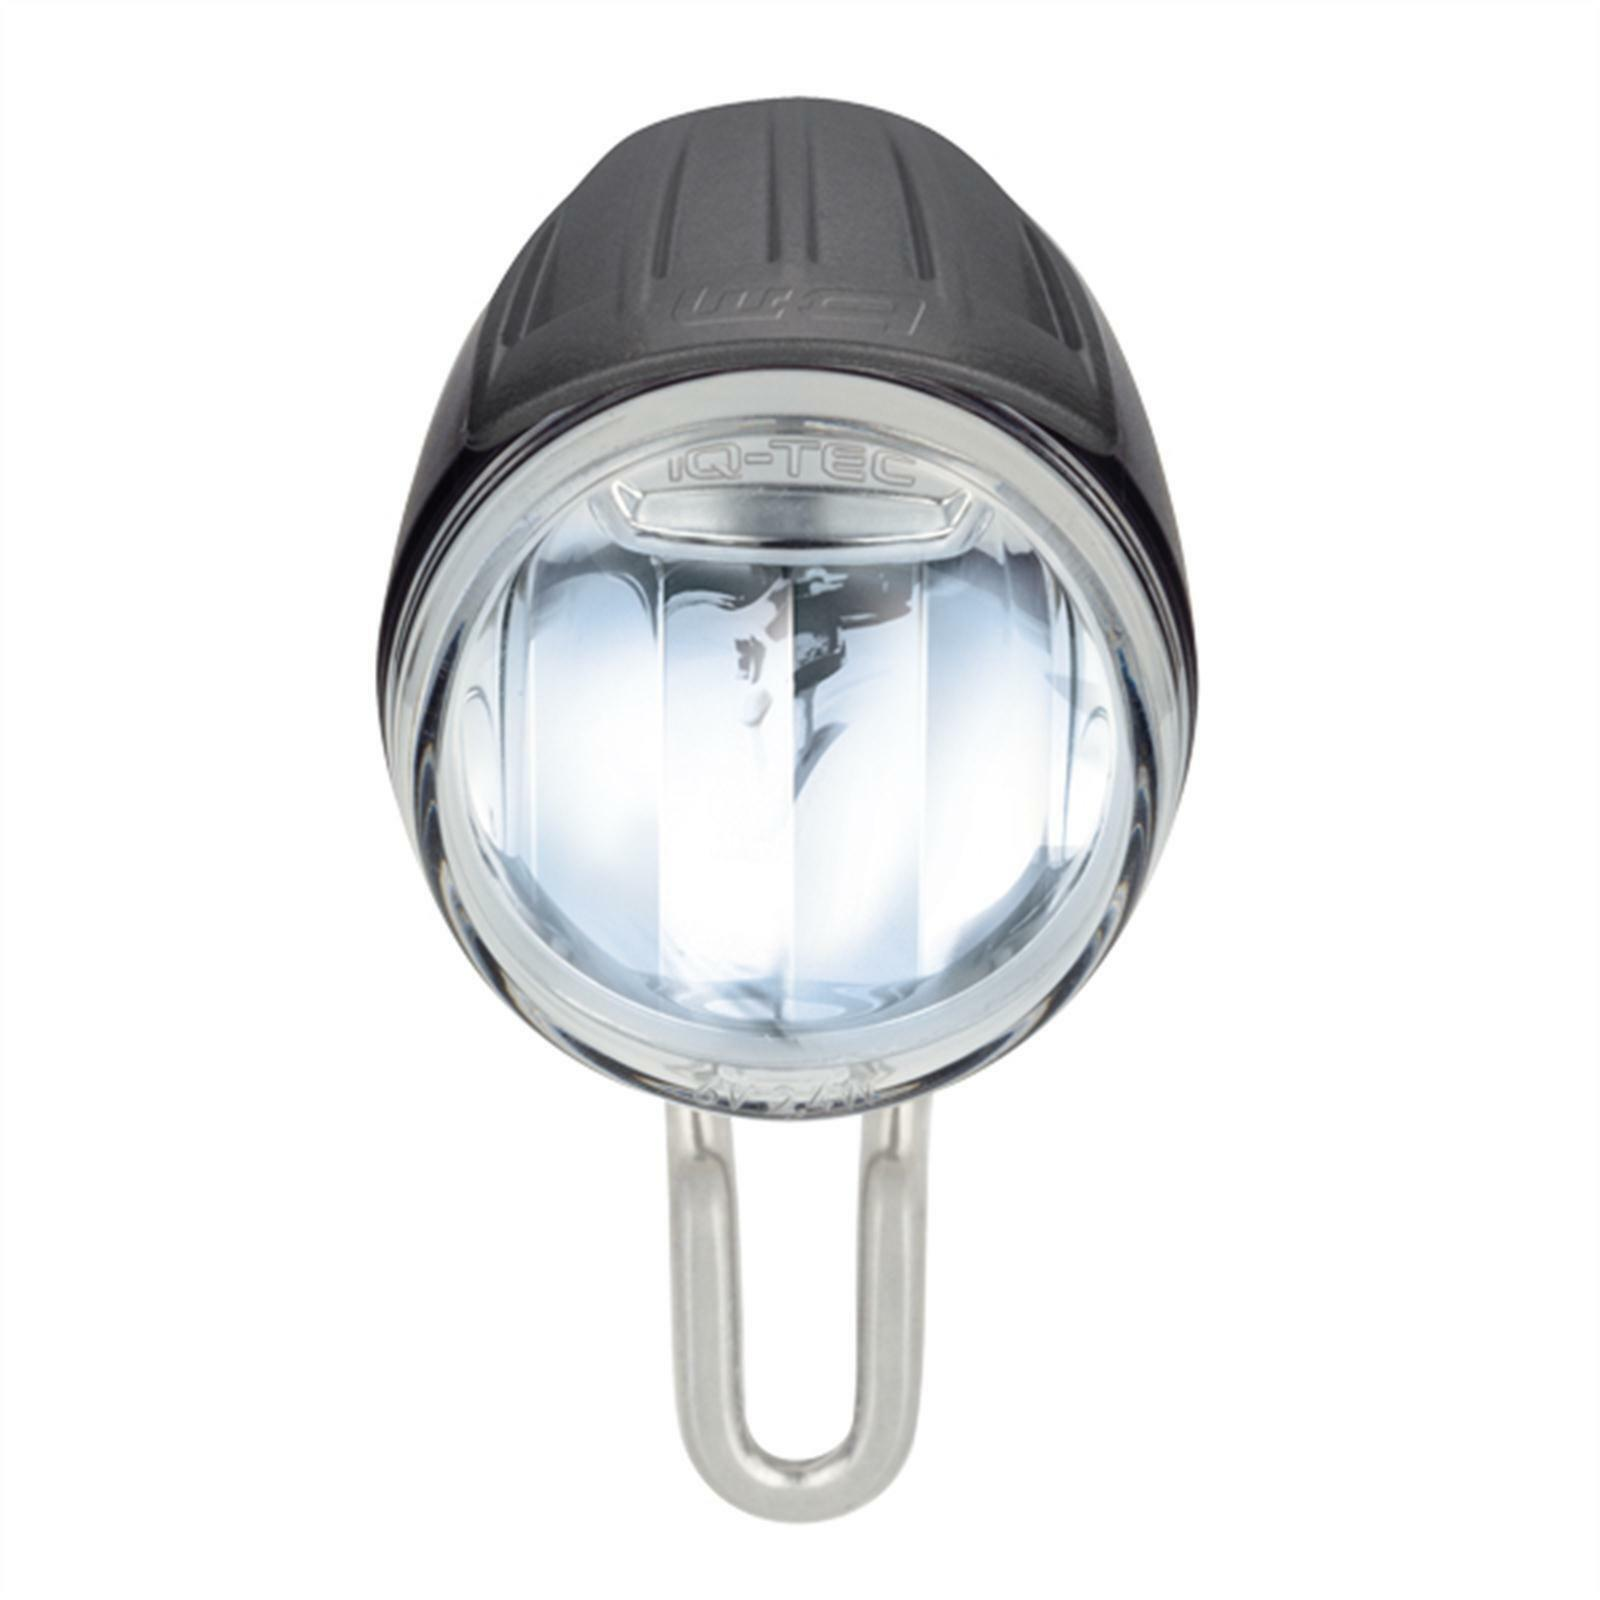 Busch & Müller LUMOTEC IQ Cyo  senso plus 175QSNDI 60 LUX LED B+M Frontleuchte  outlet online store